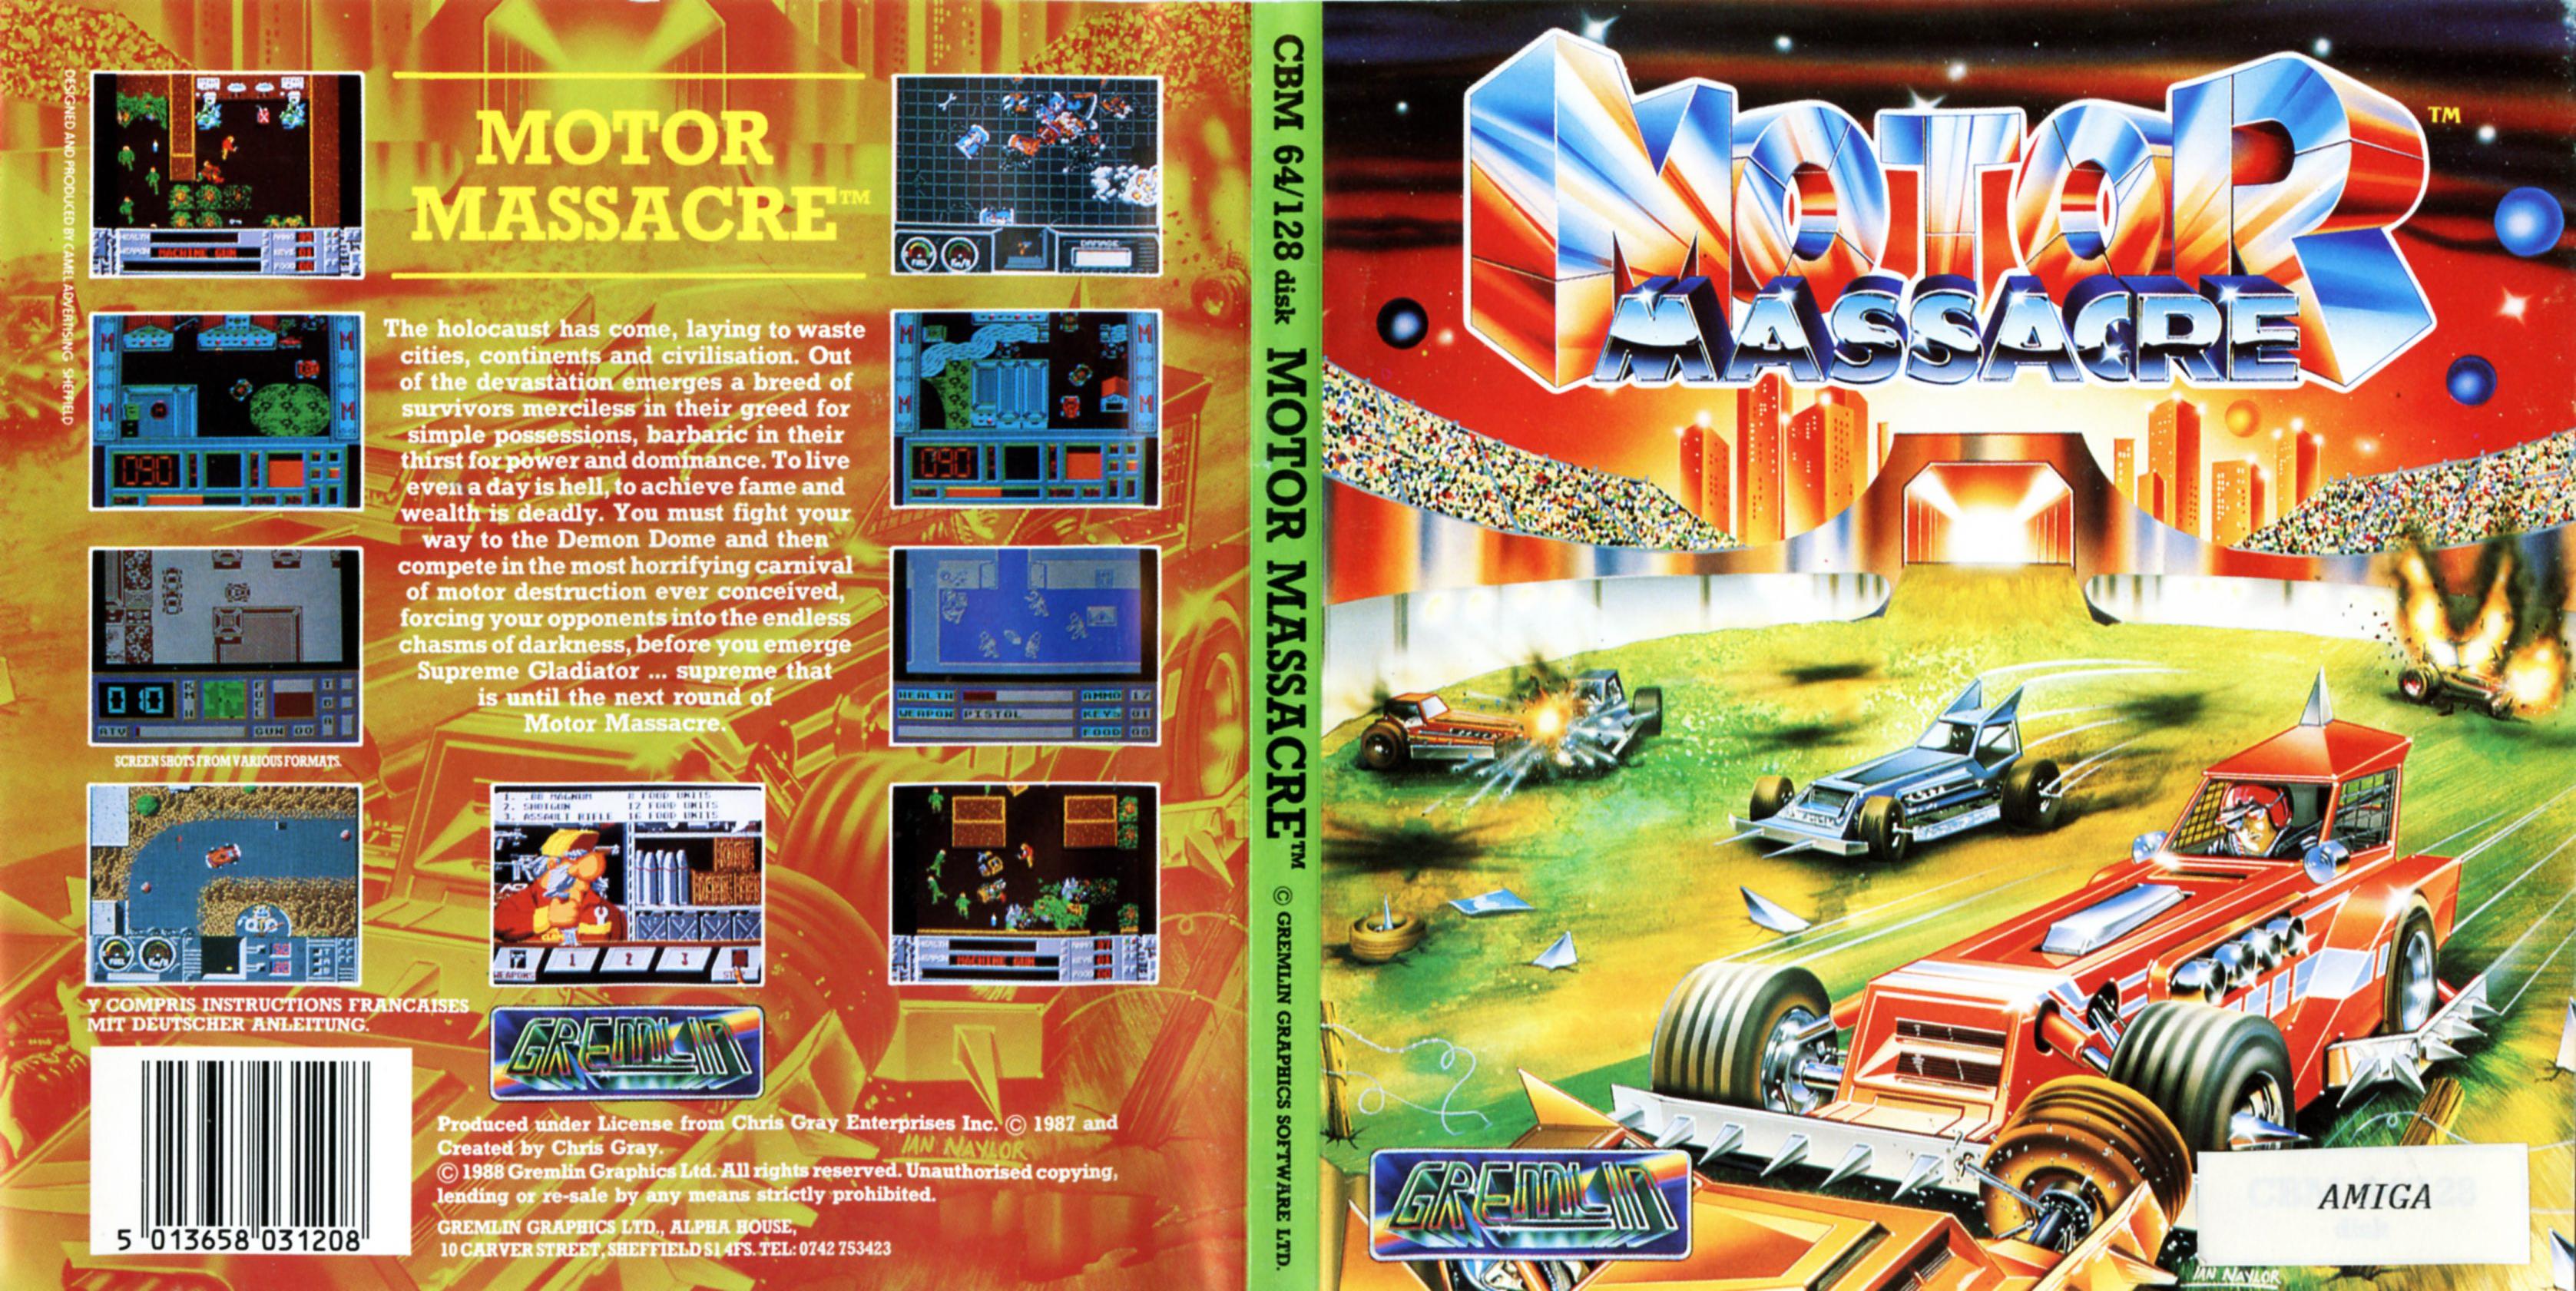 Motor Massacre (Amiga)